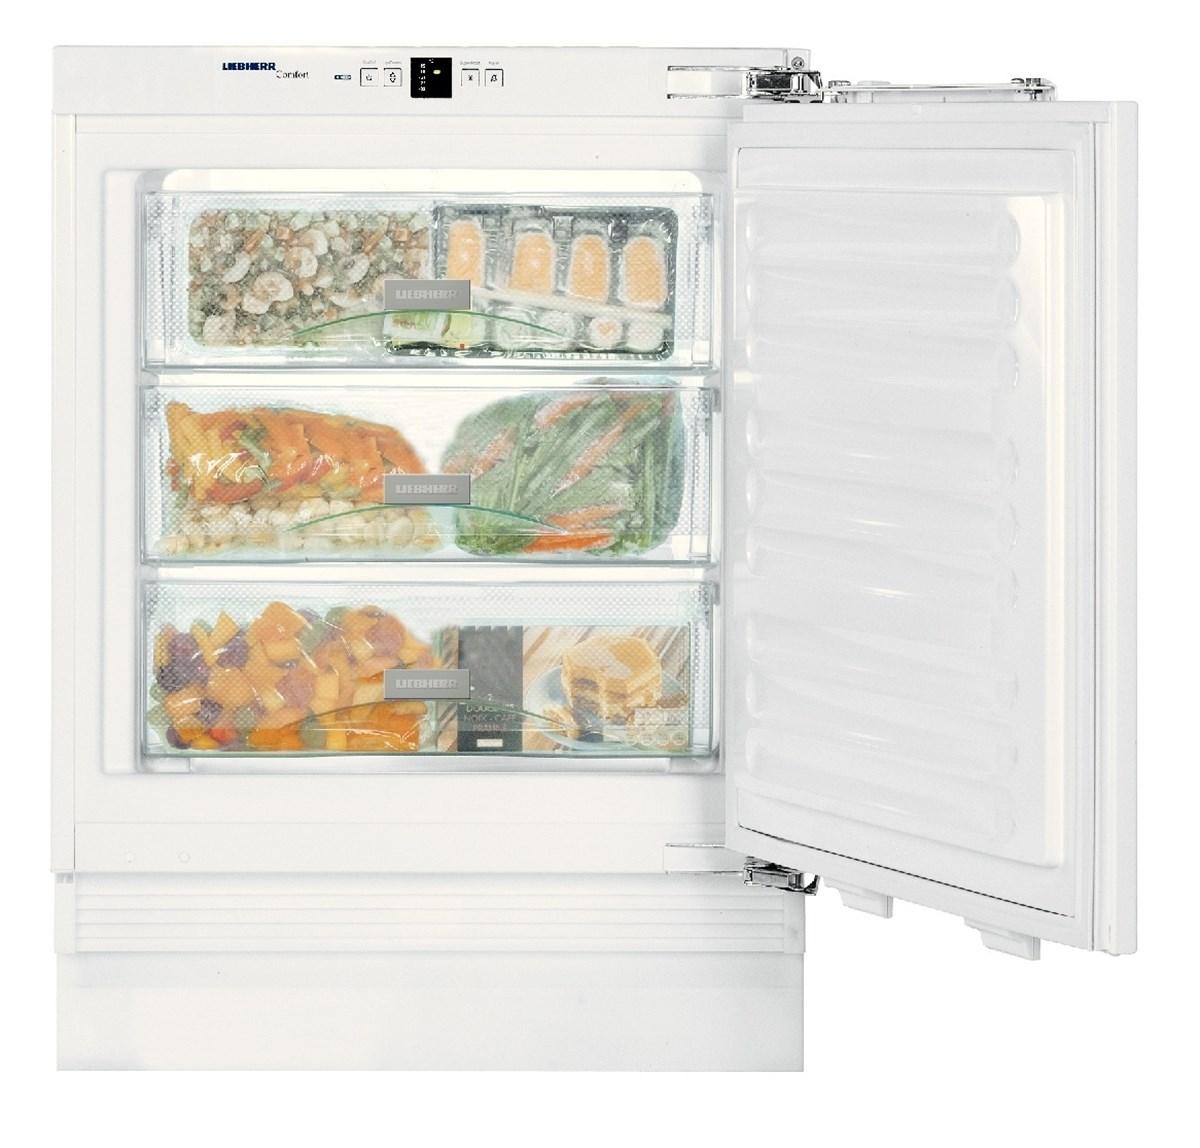 Liebherr UIG 1313 Comfort Built Under Integrated Freezer